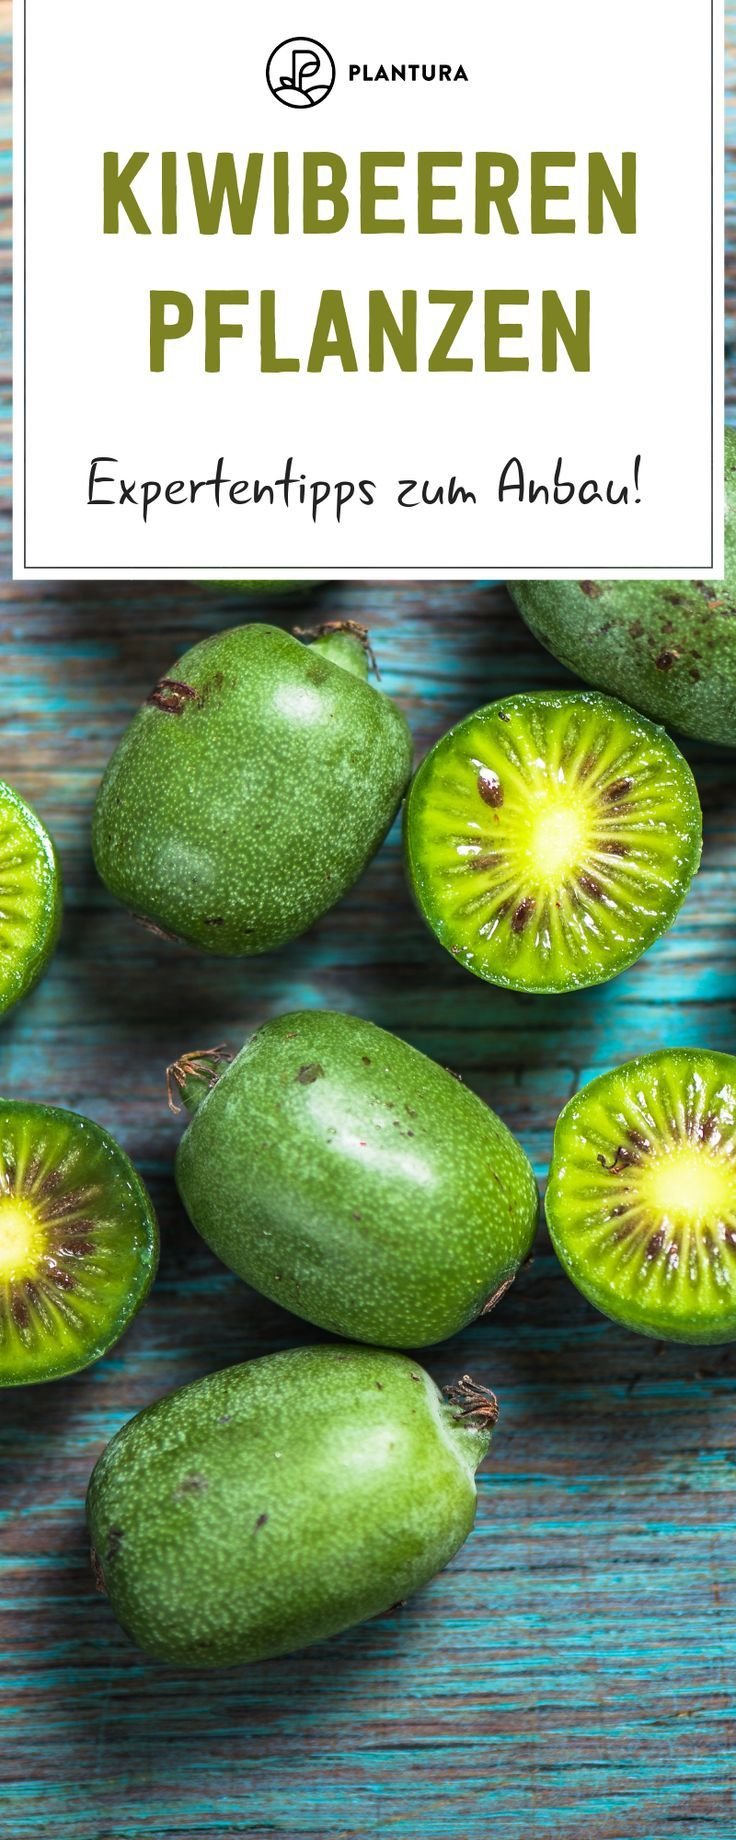 Kiwibeeren pflanzen: Experten-Tipps zum Anbau von Mini-Kiwis